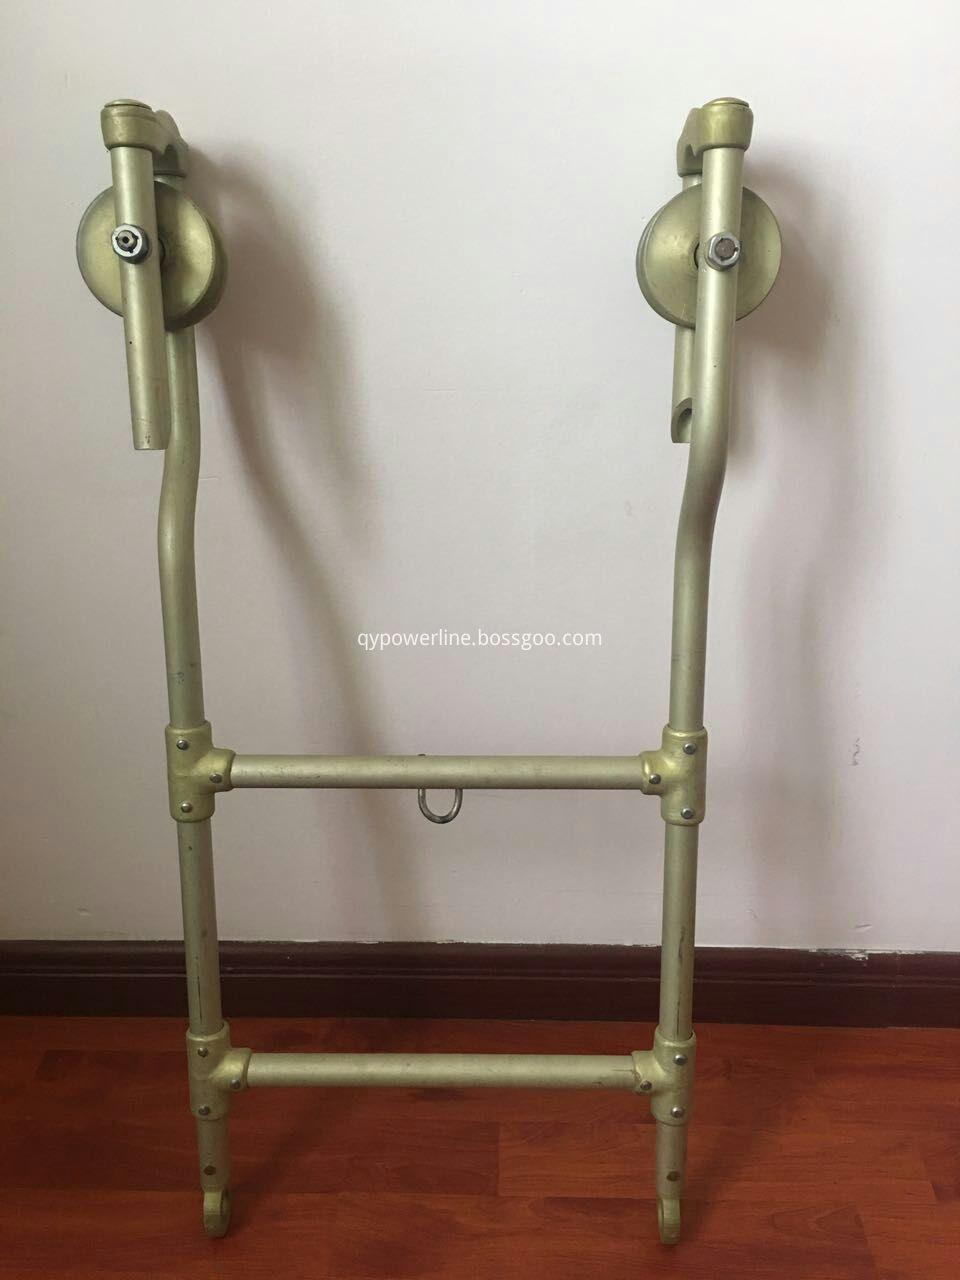 flexible ladder type